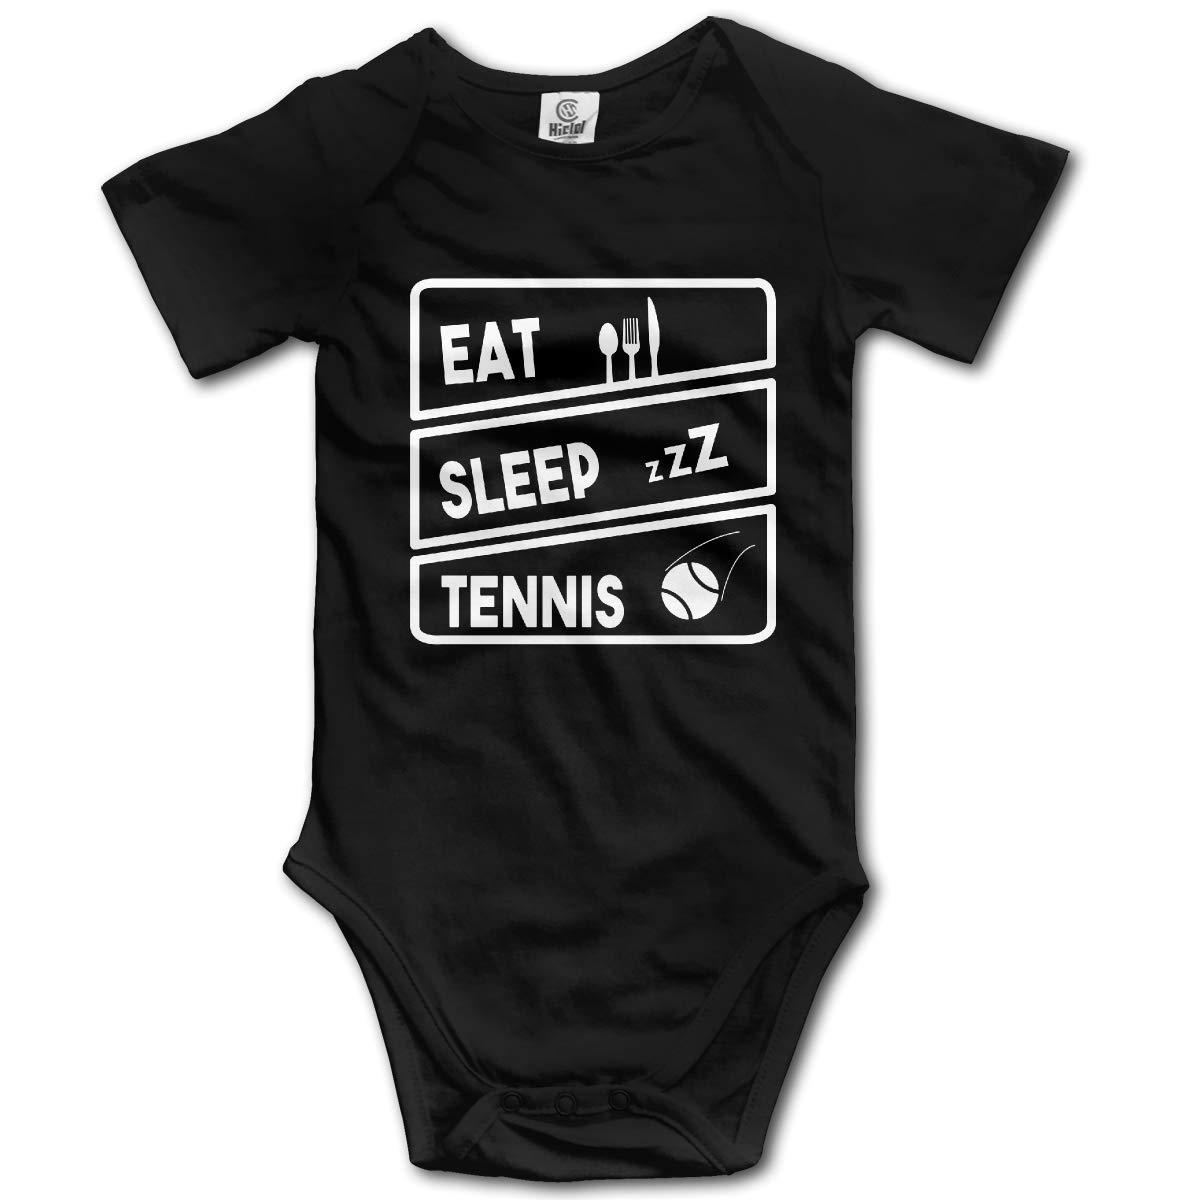 LOSPAPA Eat Sleep Tennis Baby Short Sleeve Romper Onesie Bodysuits for 0-24m Newborn Baby